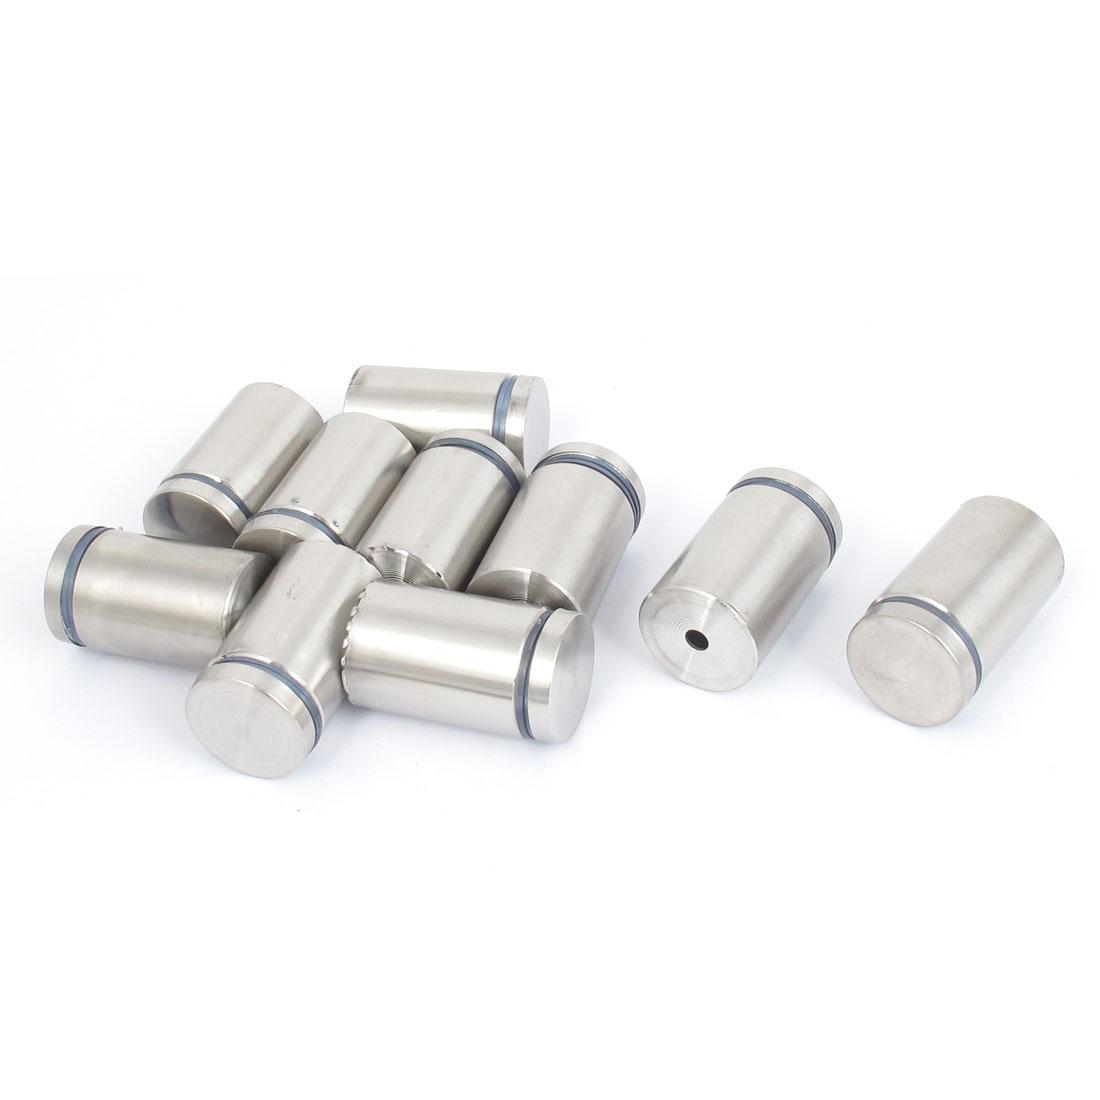 25mm x 40mm Stainless Steel Advertising Frameless Glass Standoff Pins 10pcs